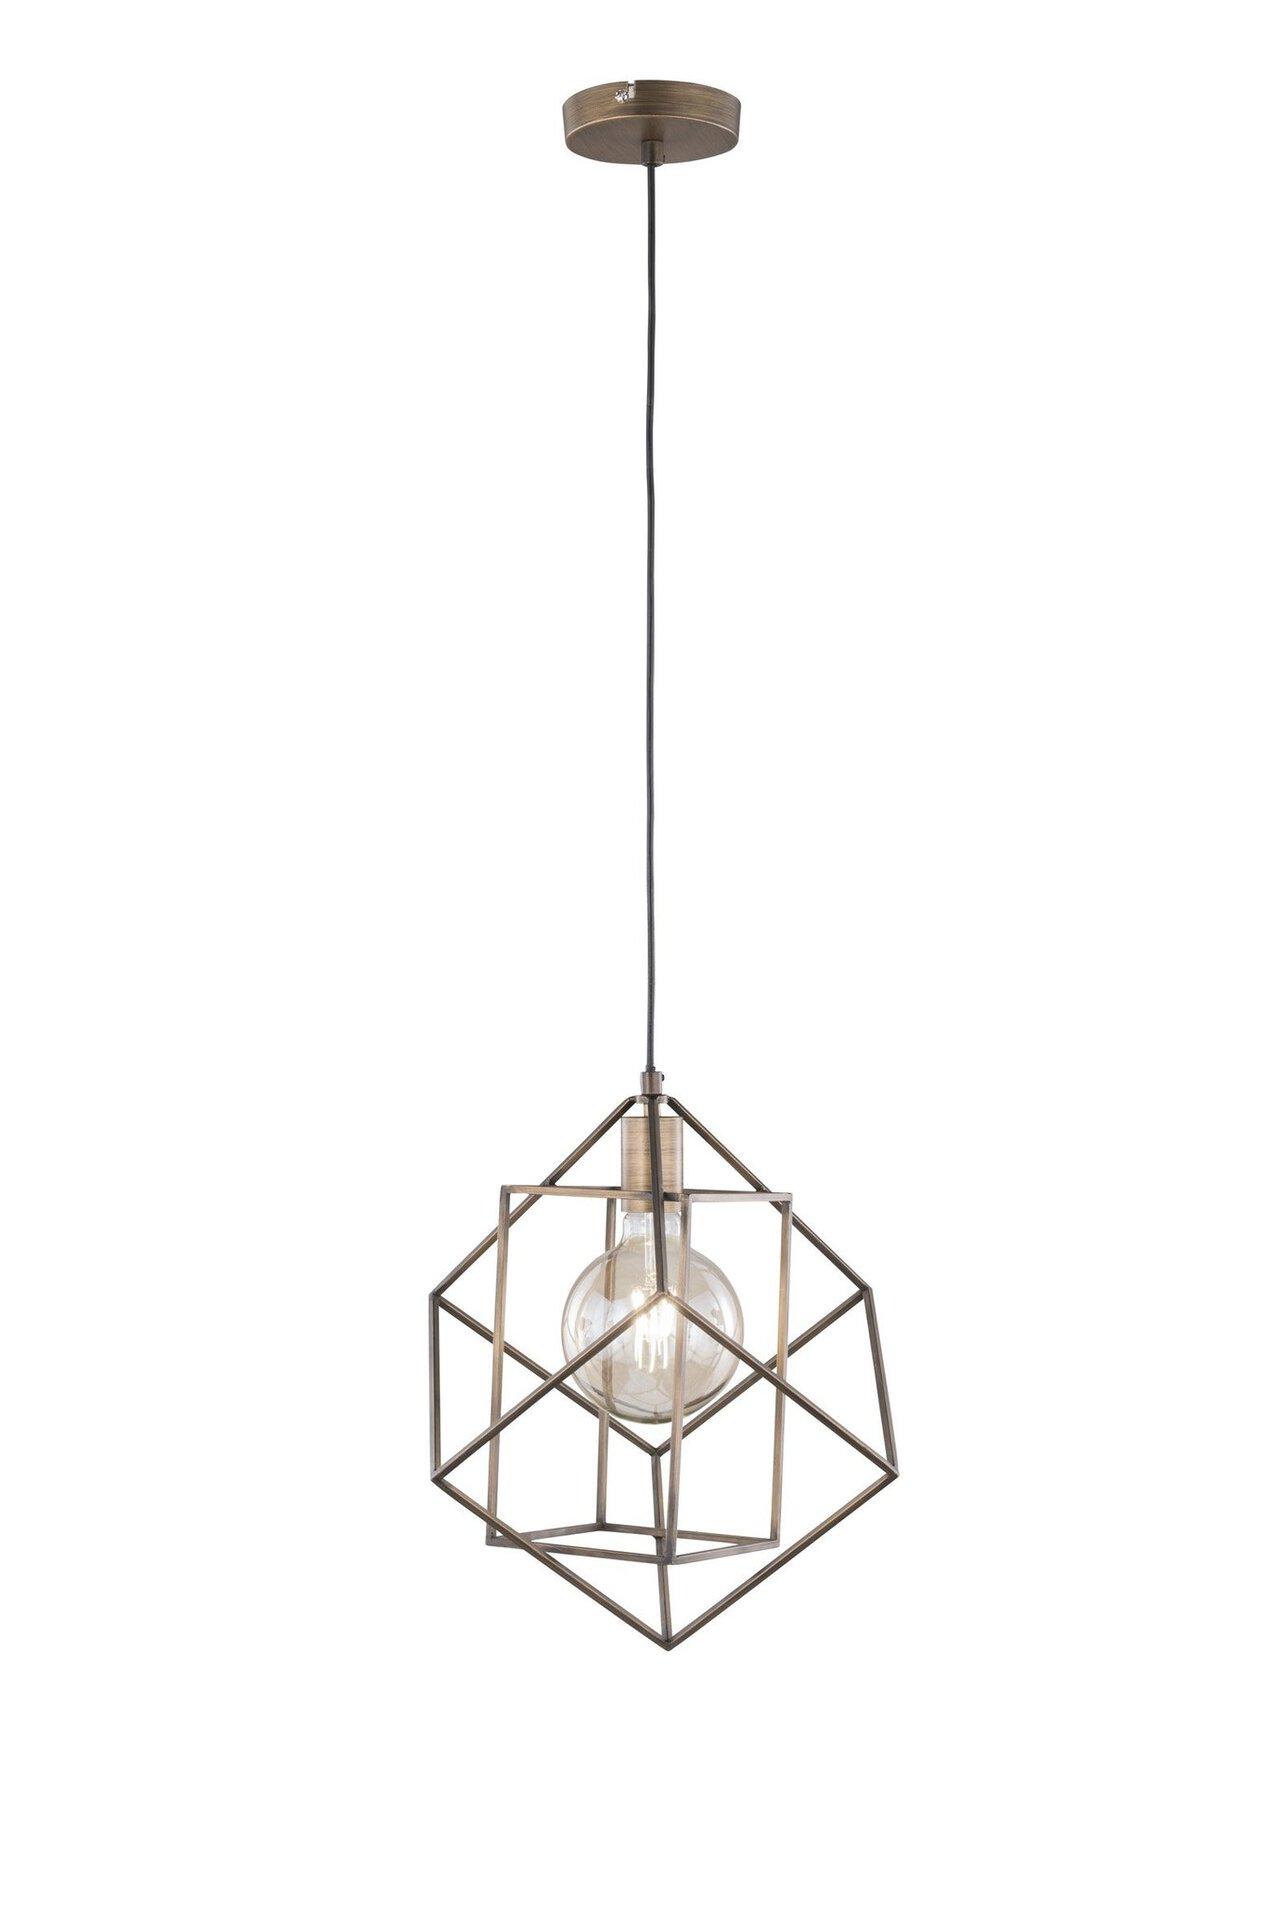 Pendelleuchte Girona Wofi Leuchten Metall 38 x 120 x 38 cm